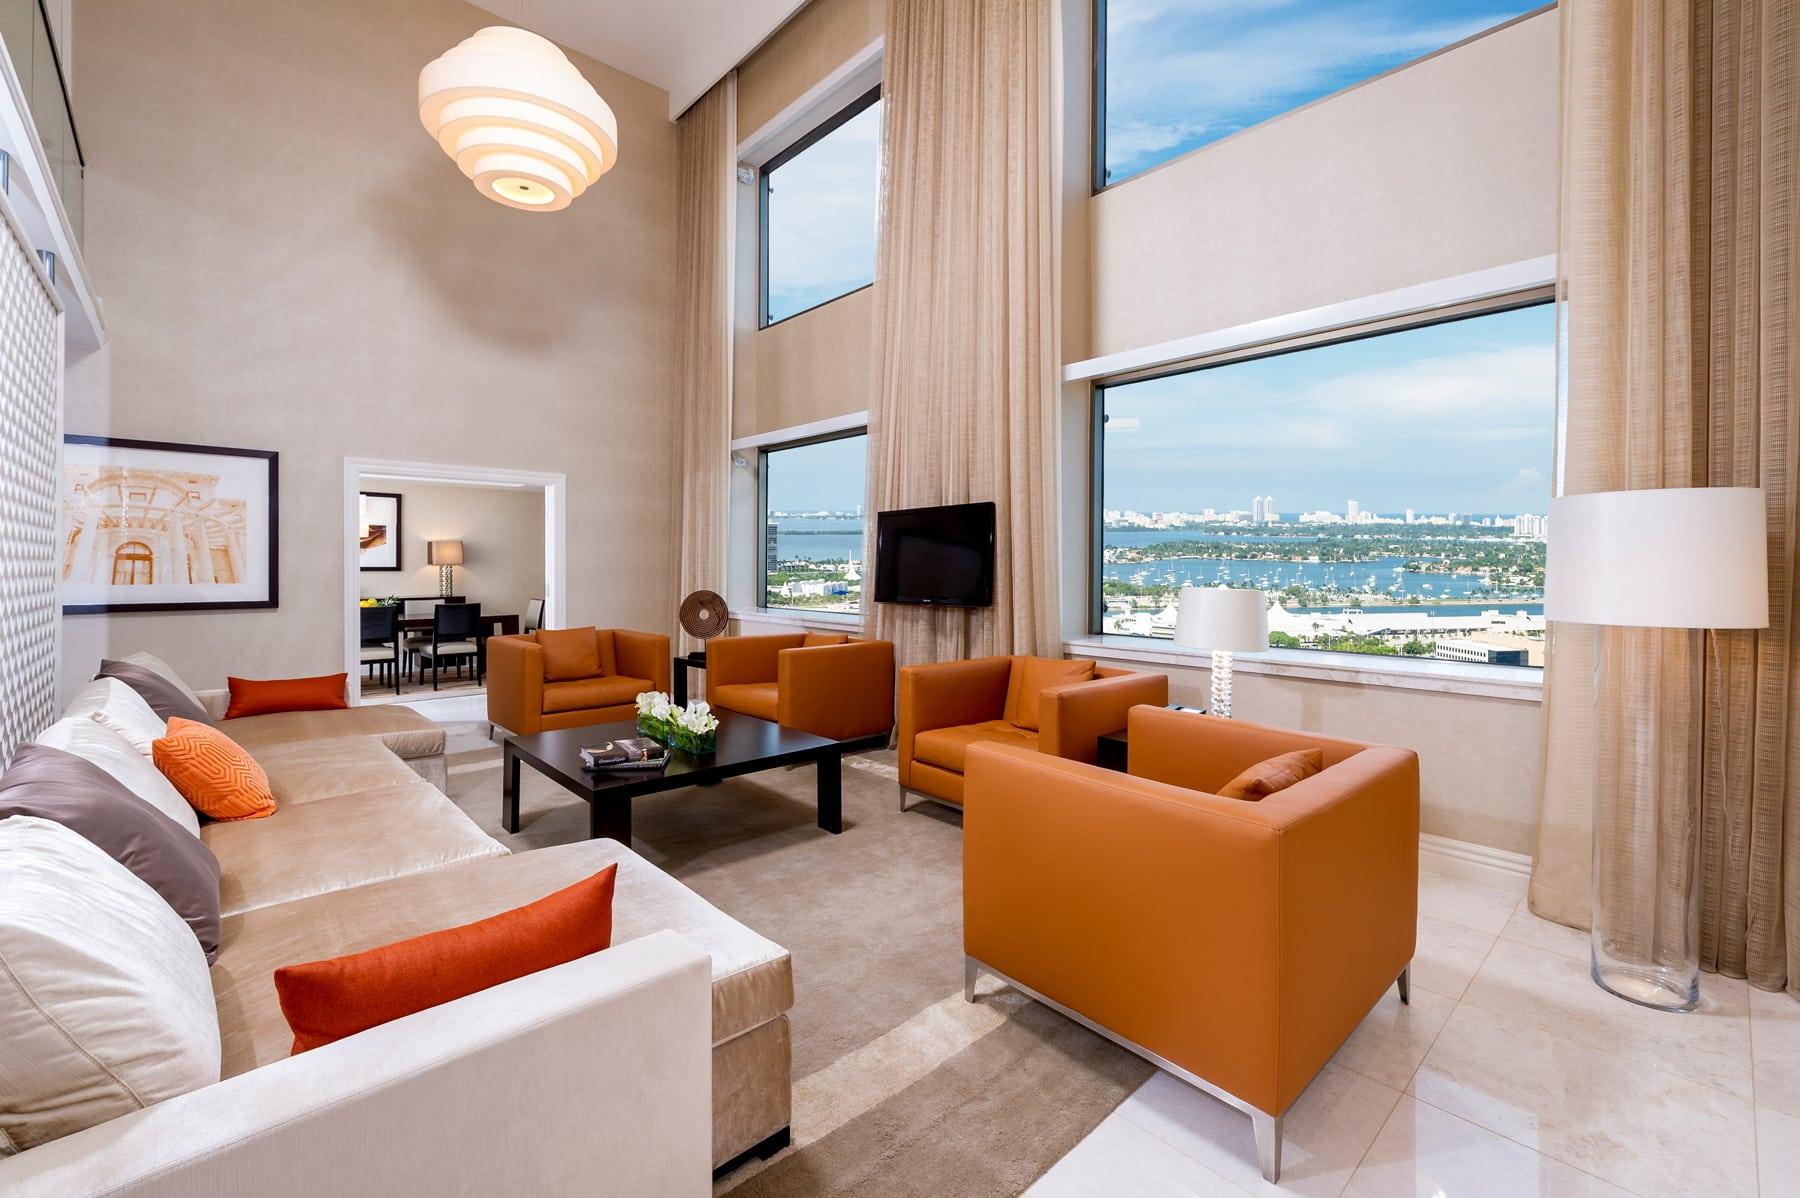 Intercontinental Hotel   Room 4   Miami, FL   Hospitality   Interior Designers